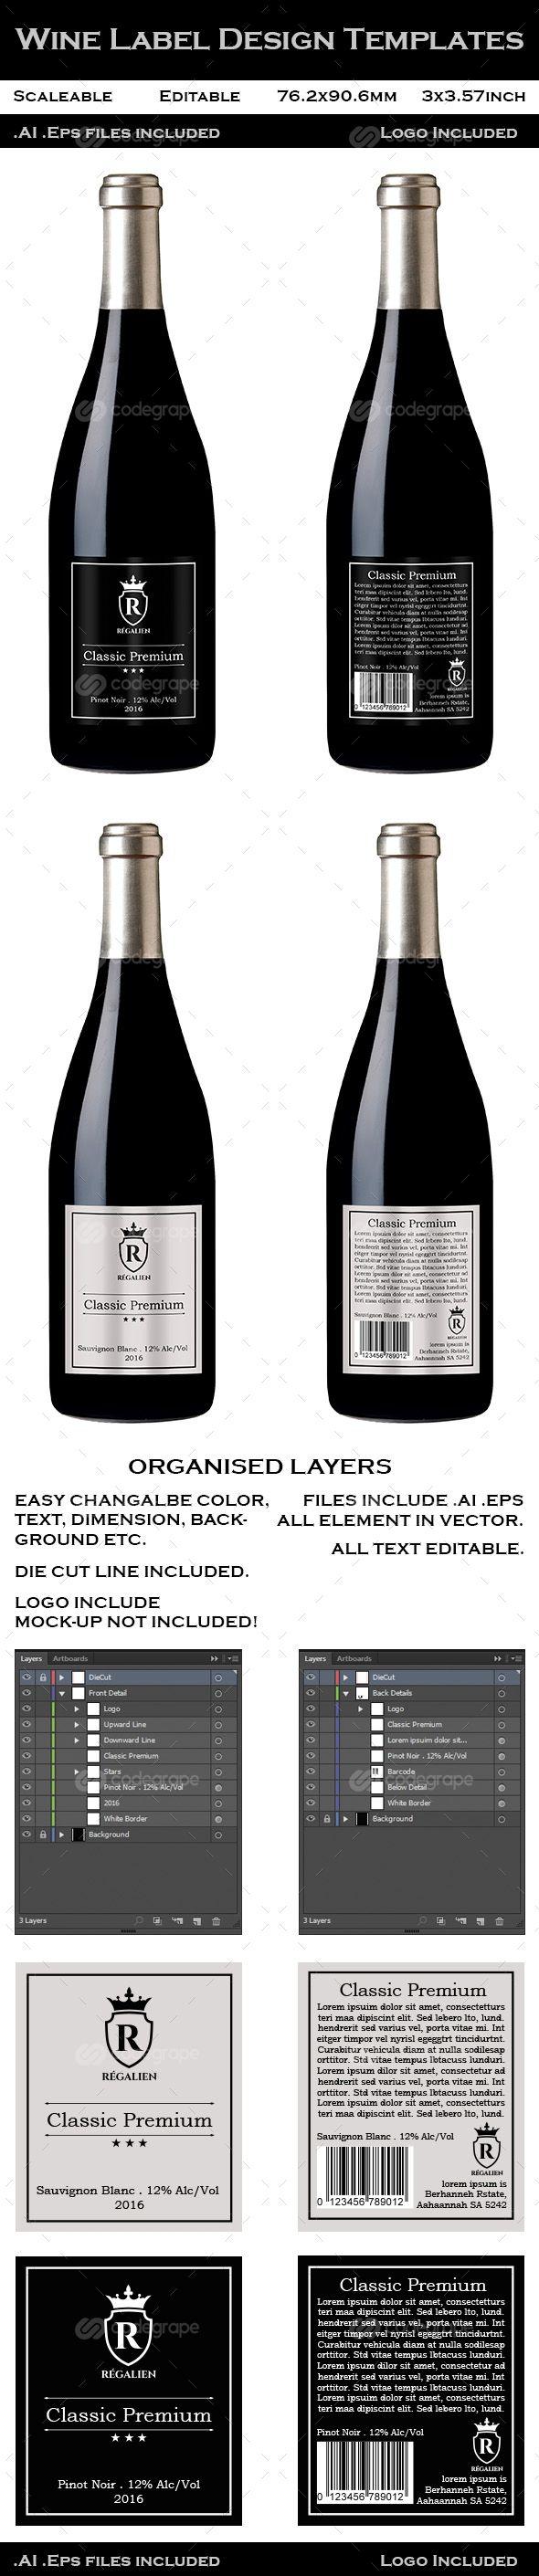 Wine Label Design Templates on @codegrape. More Info: https://www.codegrape.com/item/wine-label-design-templates/10631